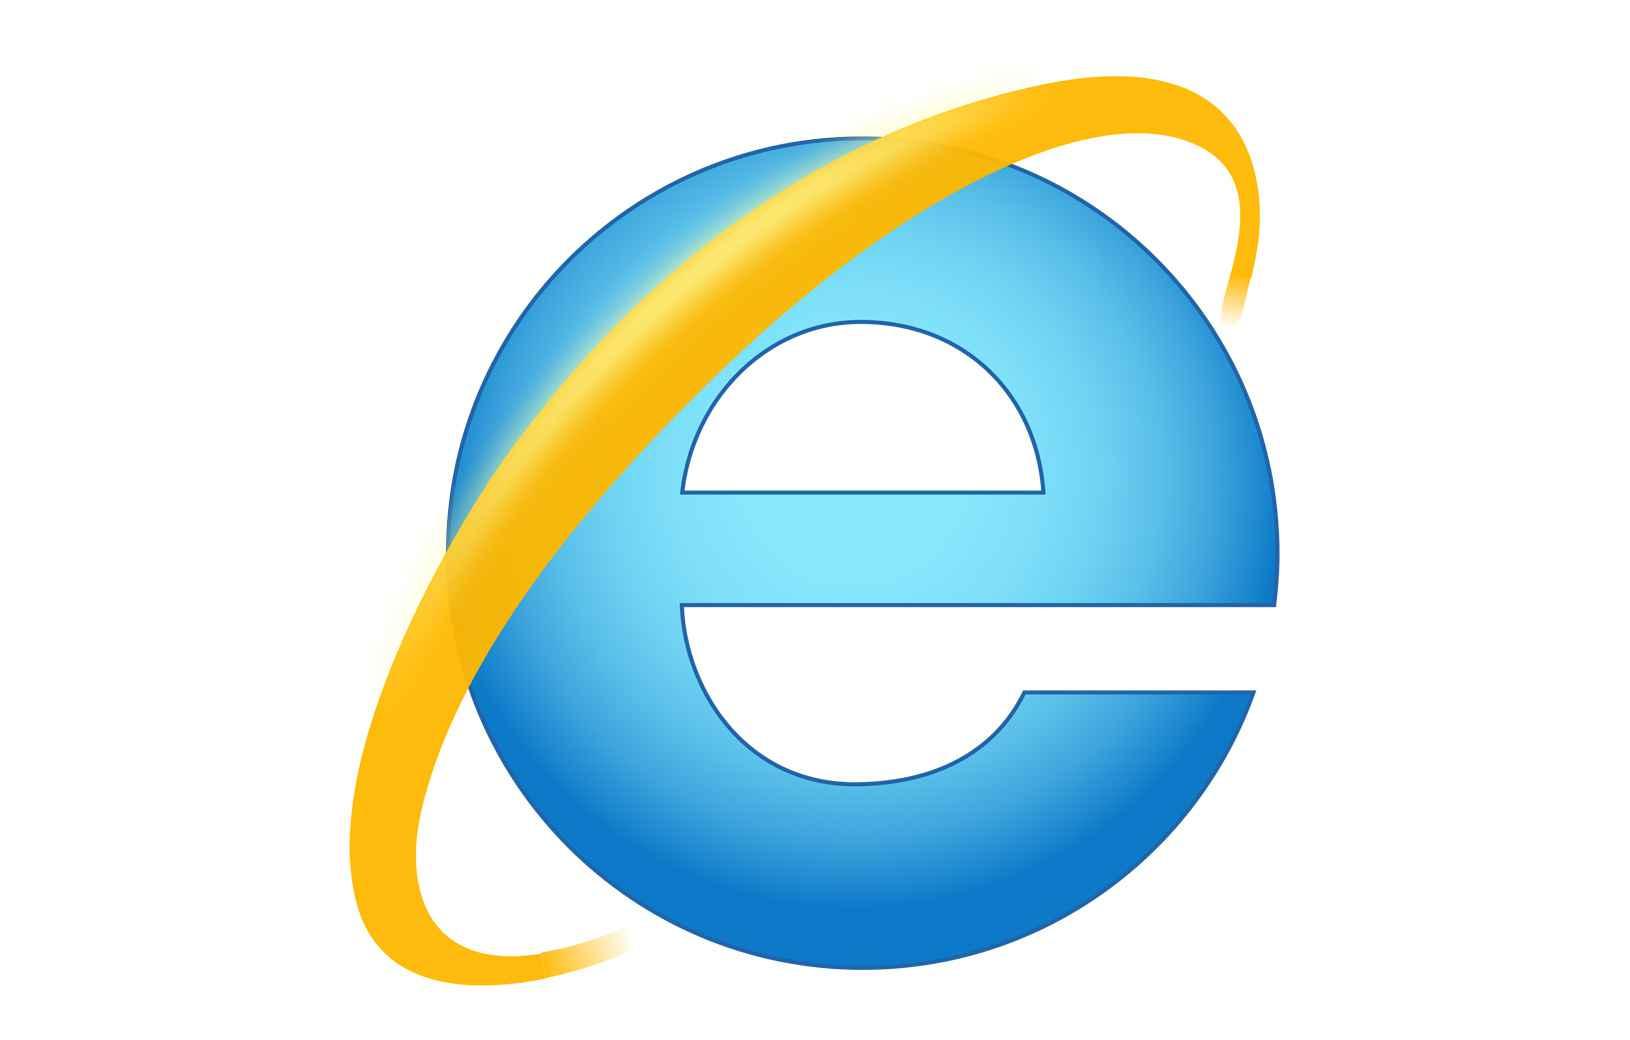 Internet Explorer Logo Wallpaper